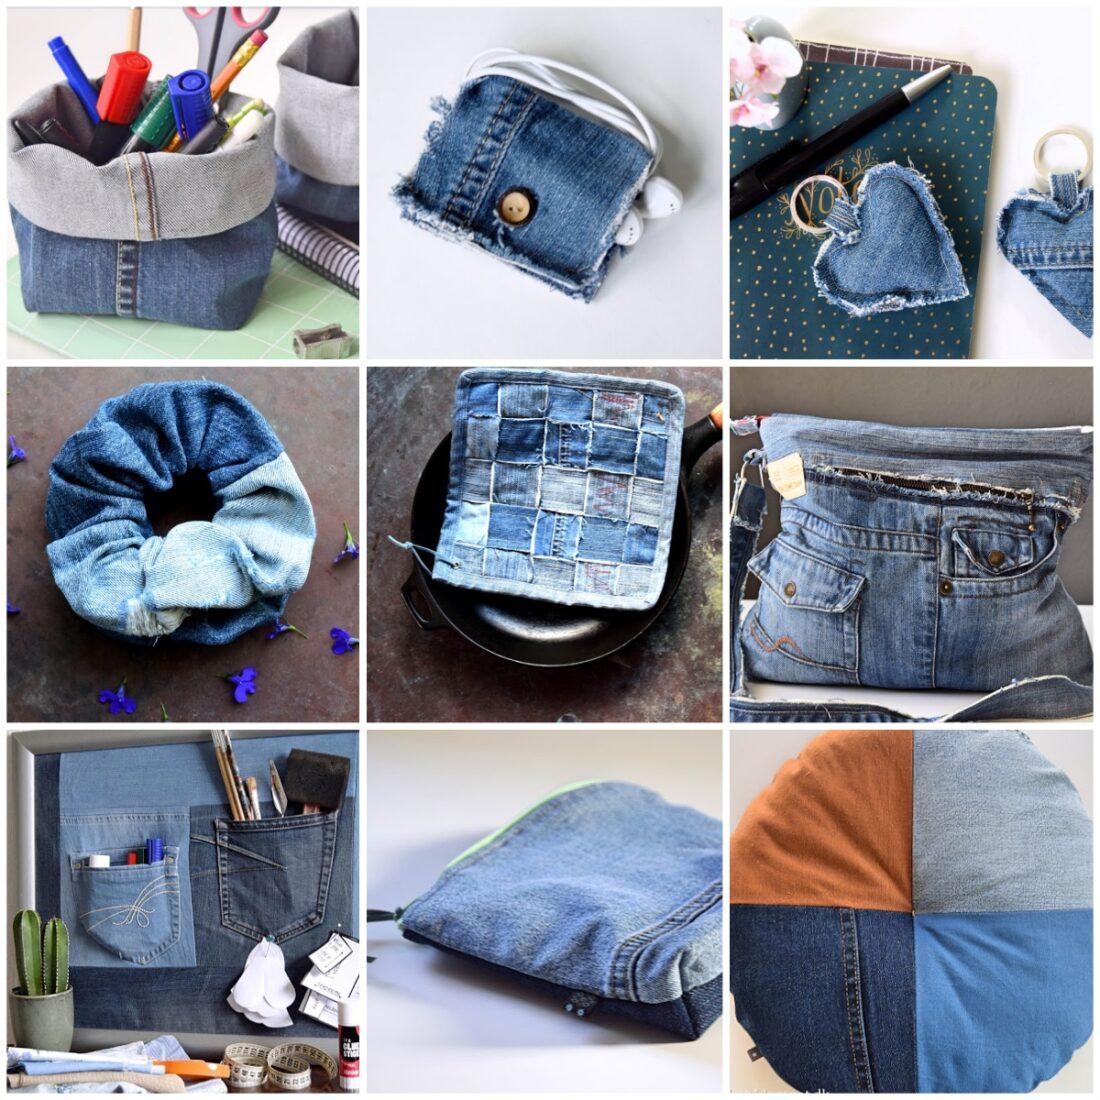 Genbrug: 9 ideer med gamle jeans